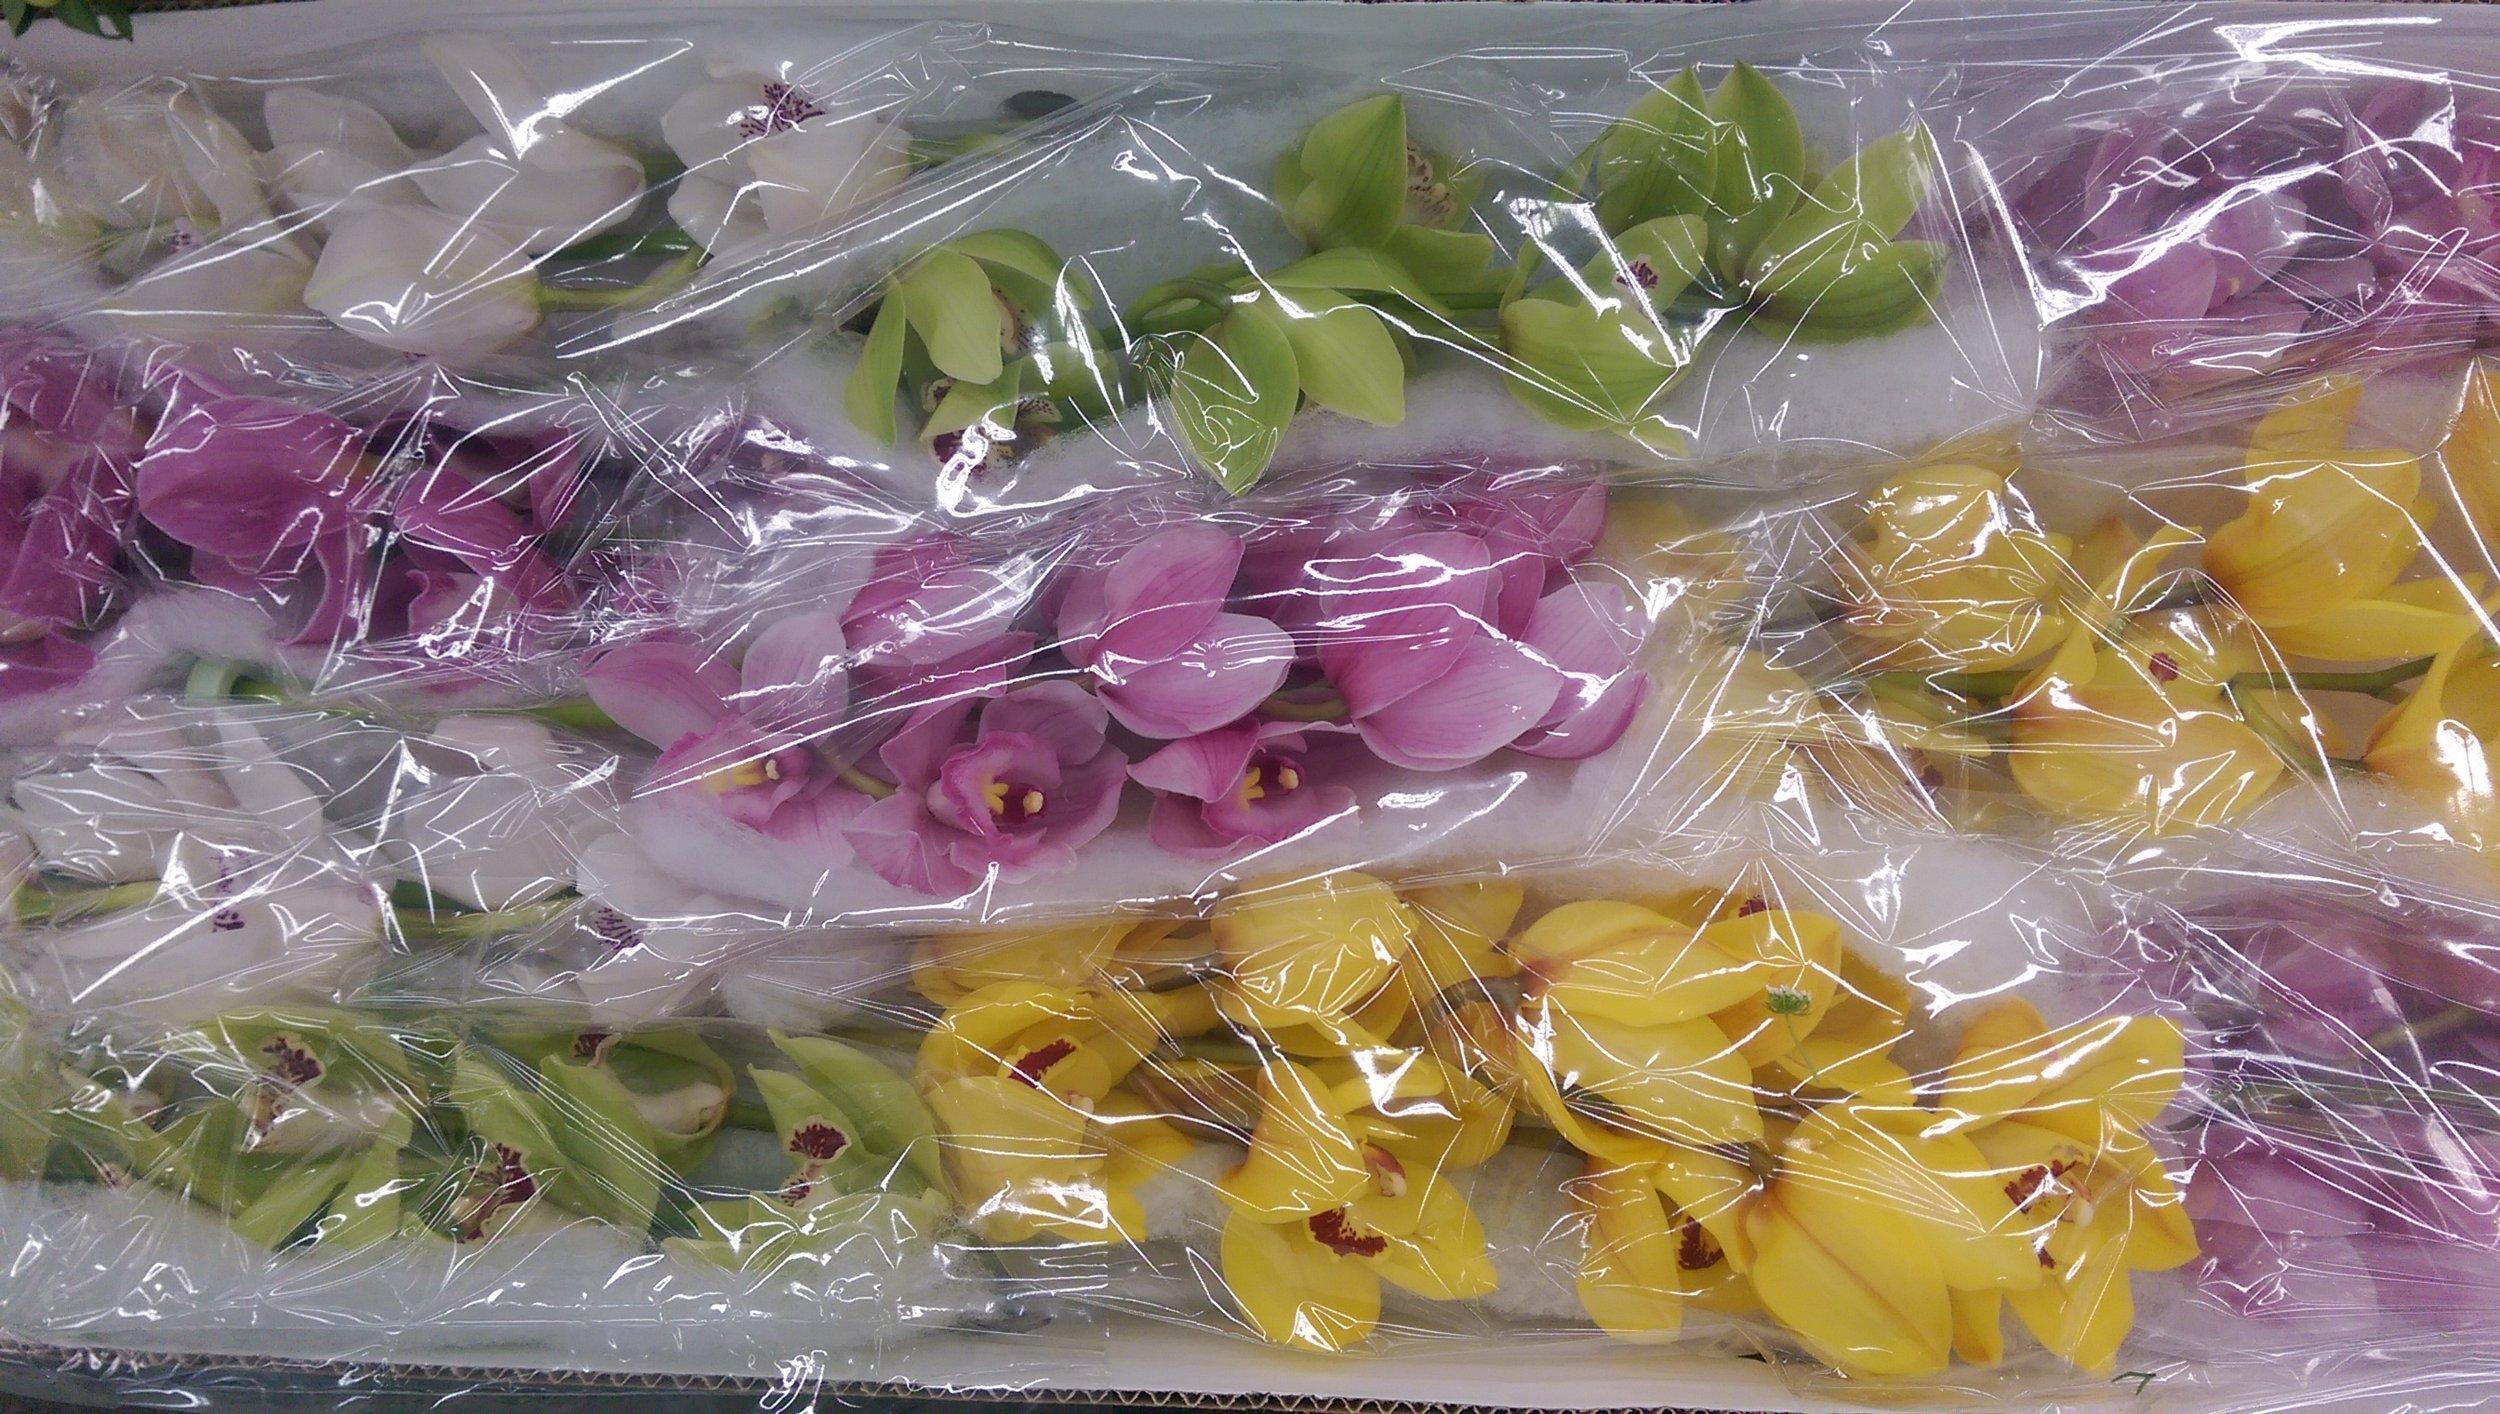 Cymbidium orchids  Year round